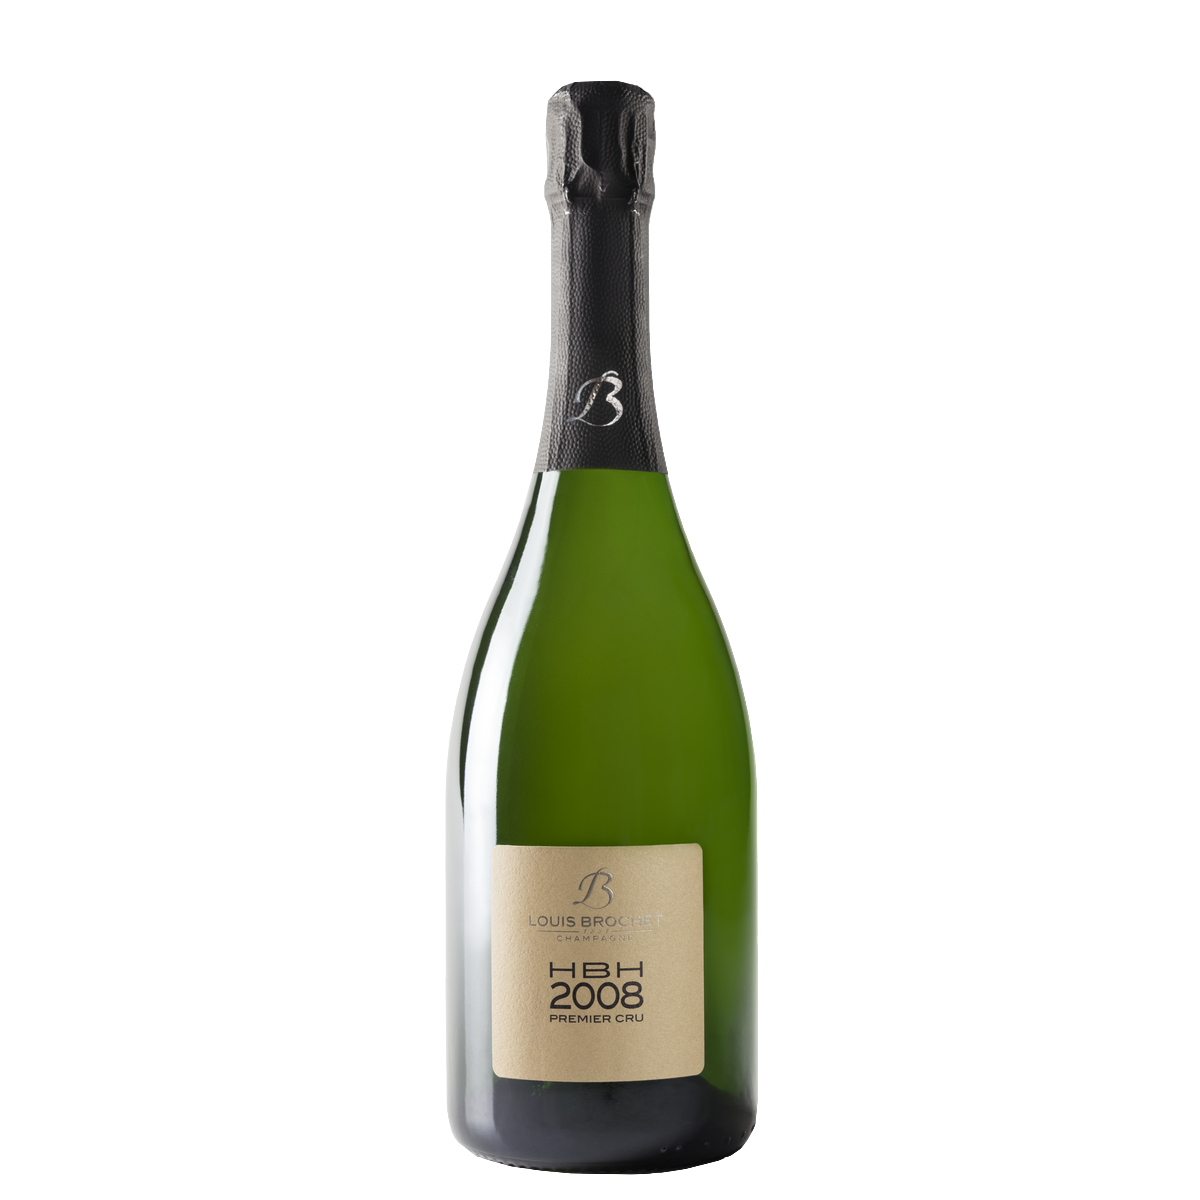 champagne HBH 2008